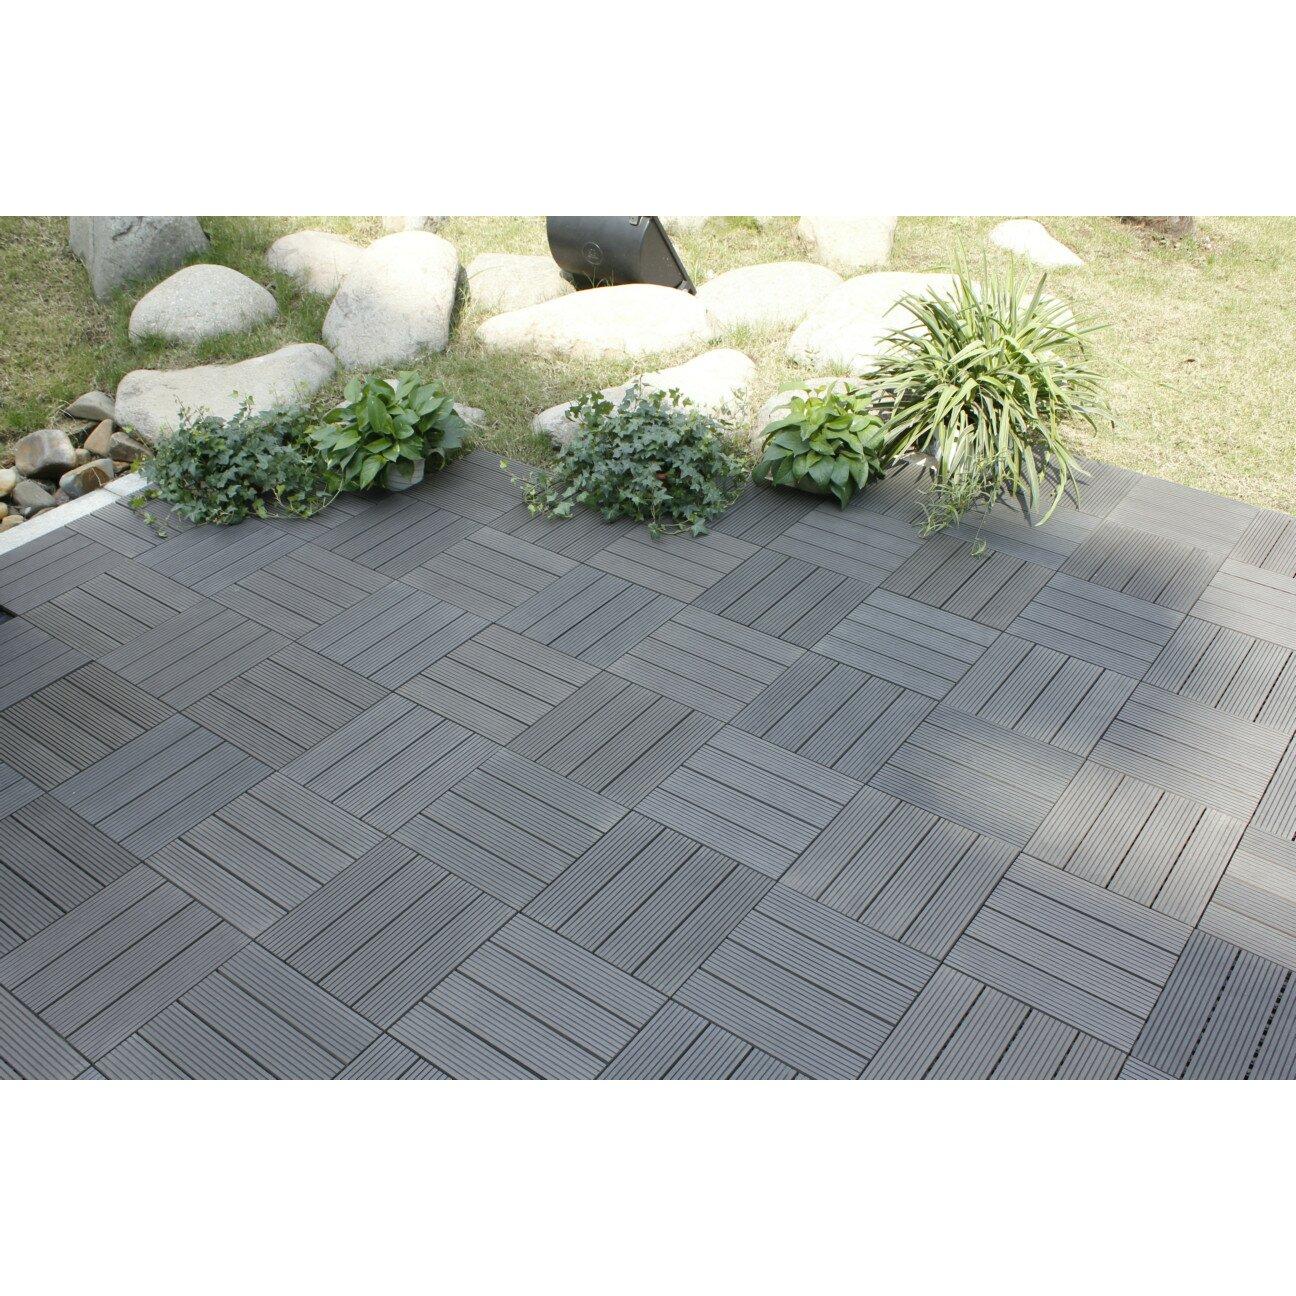 naturesort bamboo composite 12 x 12 deck tiles in grey. Black Bedroom Furniture Sets. Home Design Ideas